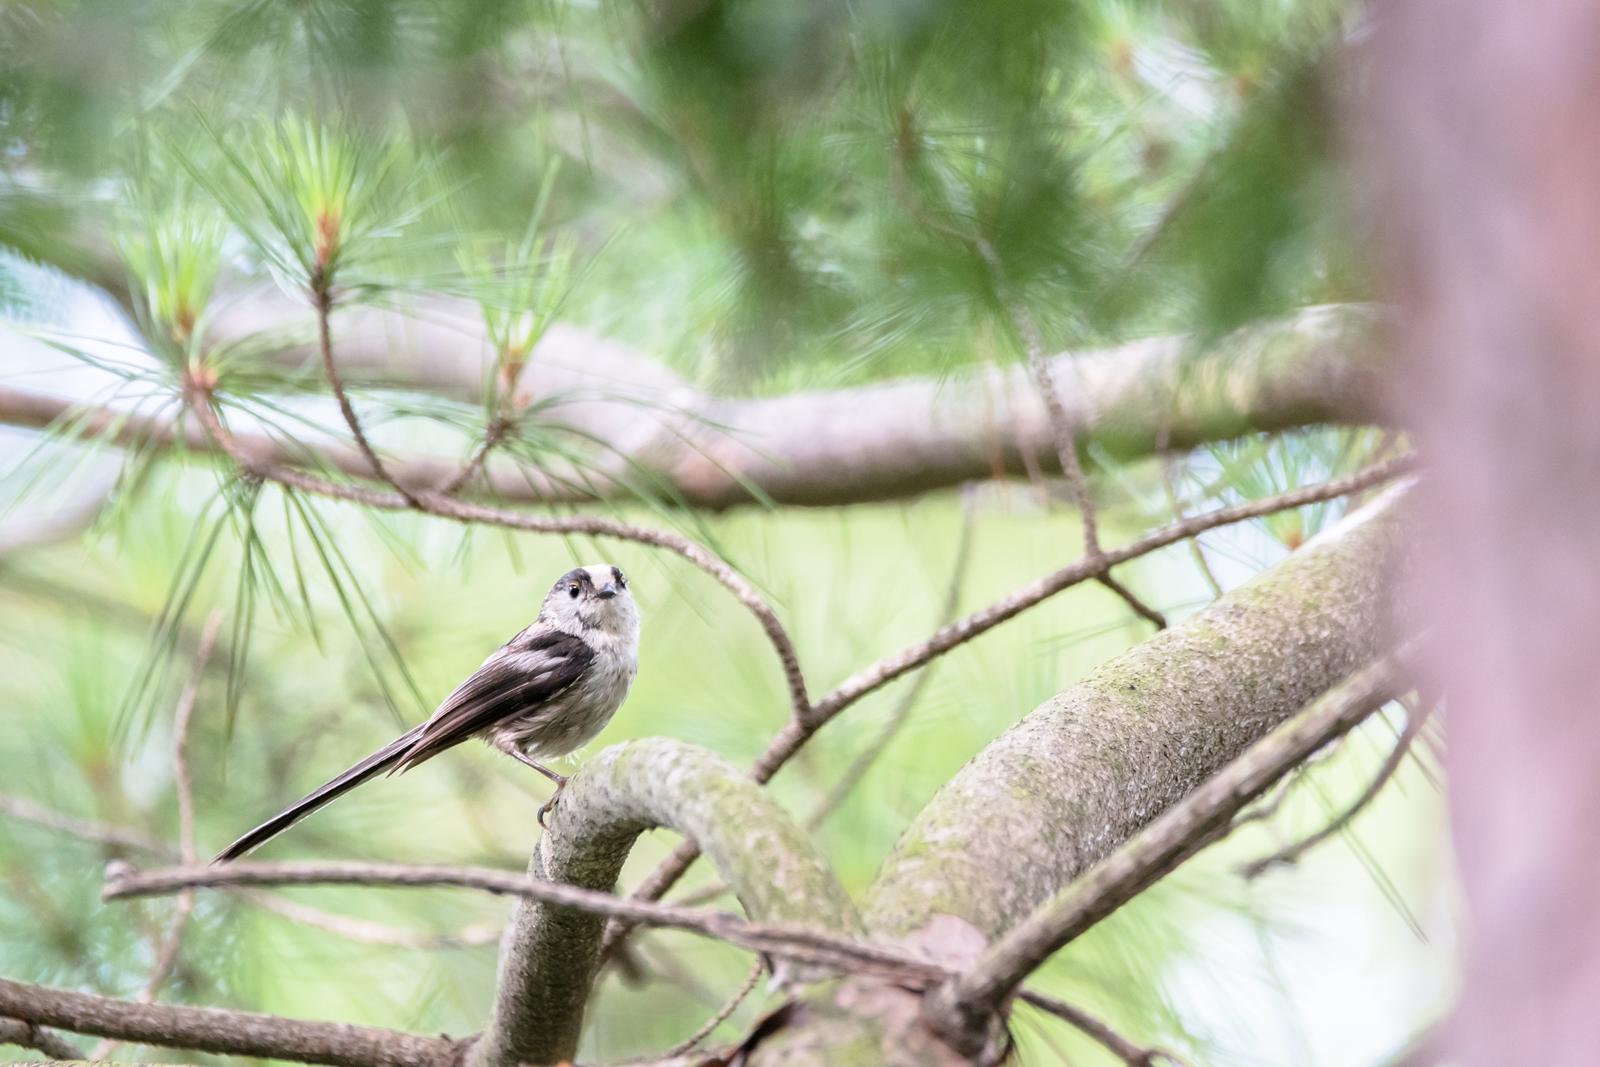 Photo: 「木陰でほっと」 / Rest in the shade of a tree.  晴れ空が嬉しくて たくさんたくさん飛びまわる そして少しだけ木陰で足を止める ほっとする一休み  Long-tailed Tit. (エナガ)  Nikon D500 SIGMA 150-600mm F5-6.3 DG OS HSM Contemporary  #birdphotography #birds #kawaii #ことり #小鳥 #nikon #sigma  ( http://takafumiooshio.com/archives/2727 )